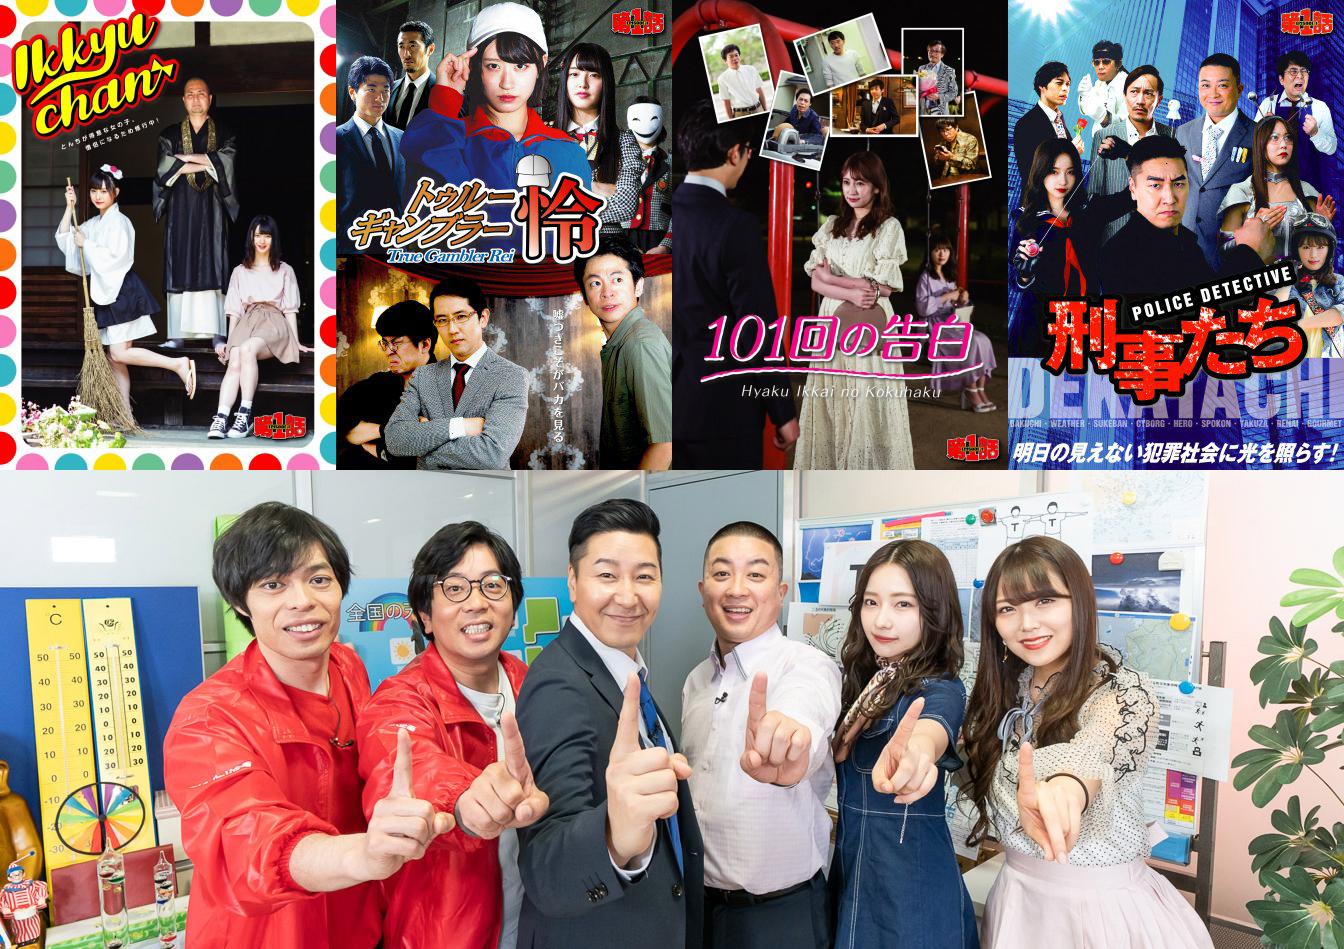 【NMB48】ABCテレビ「第1話」のインタビュー記事と#9〜#12の情報が公開。